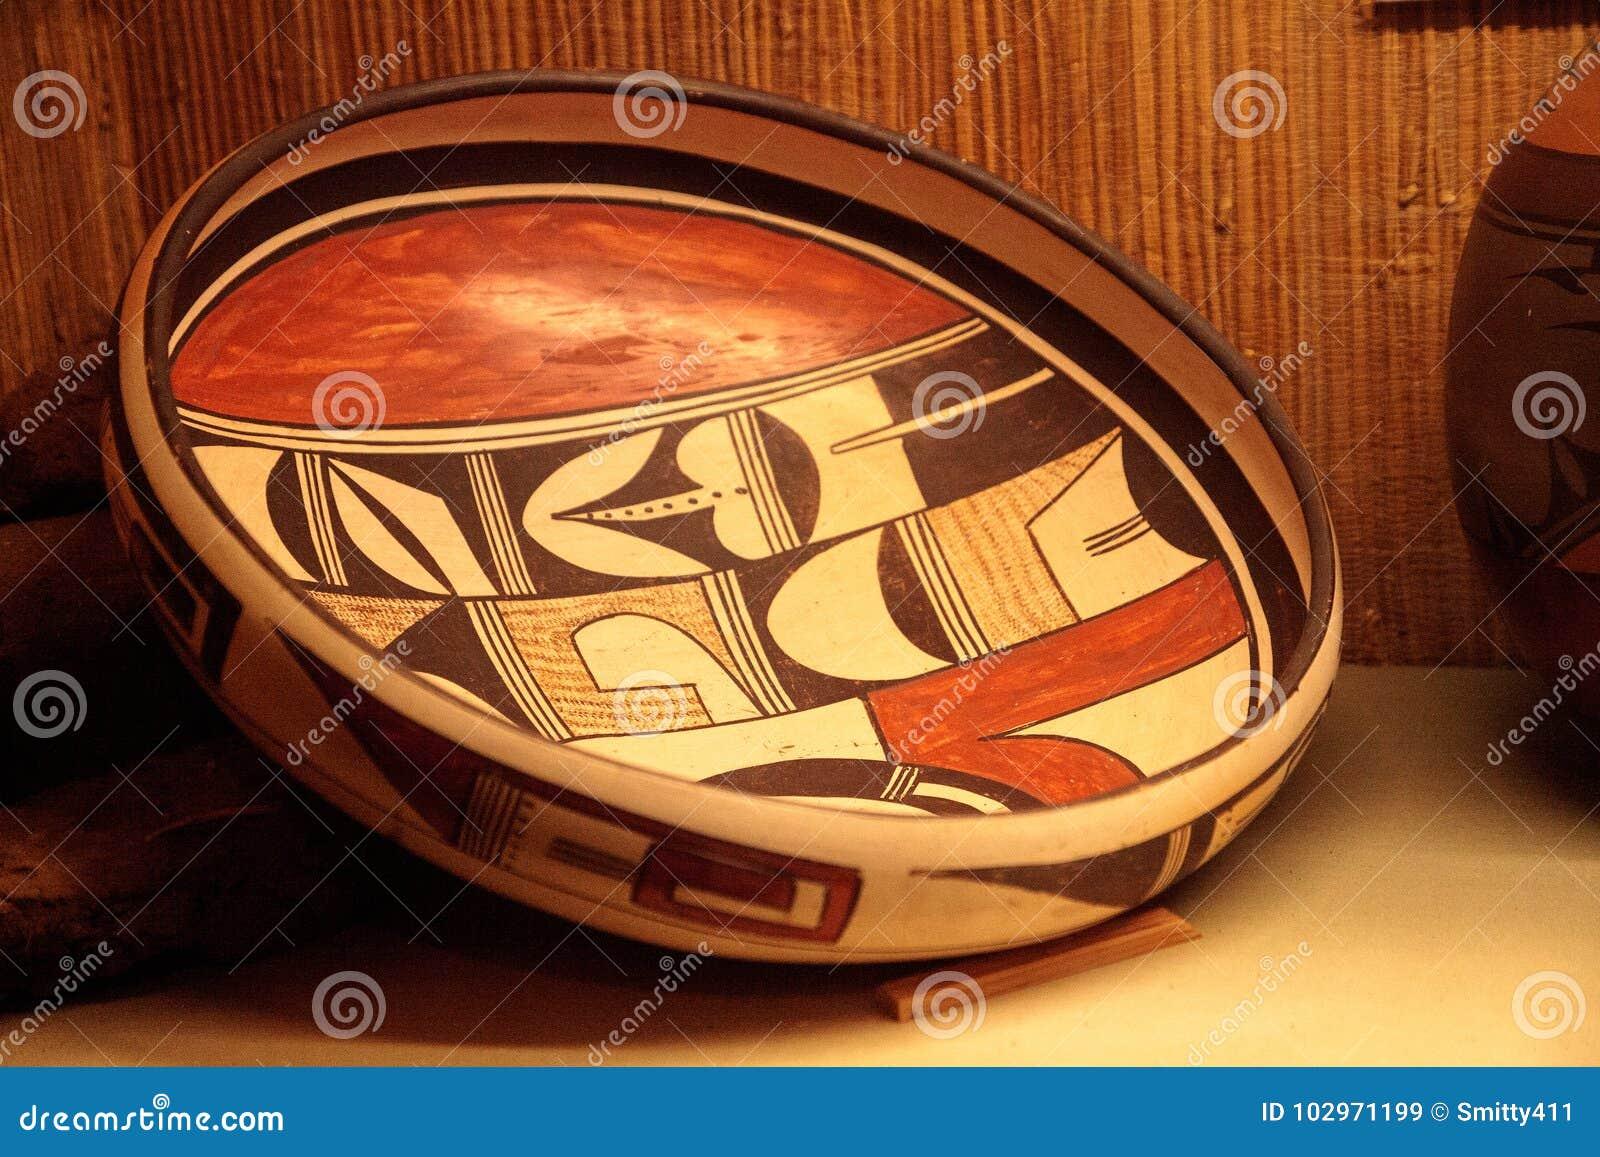 Acoma Pueblo Native American art from New Mexico